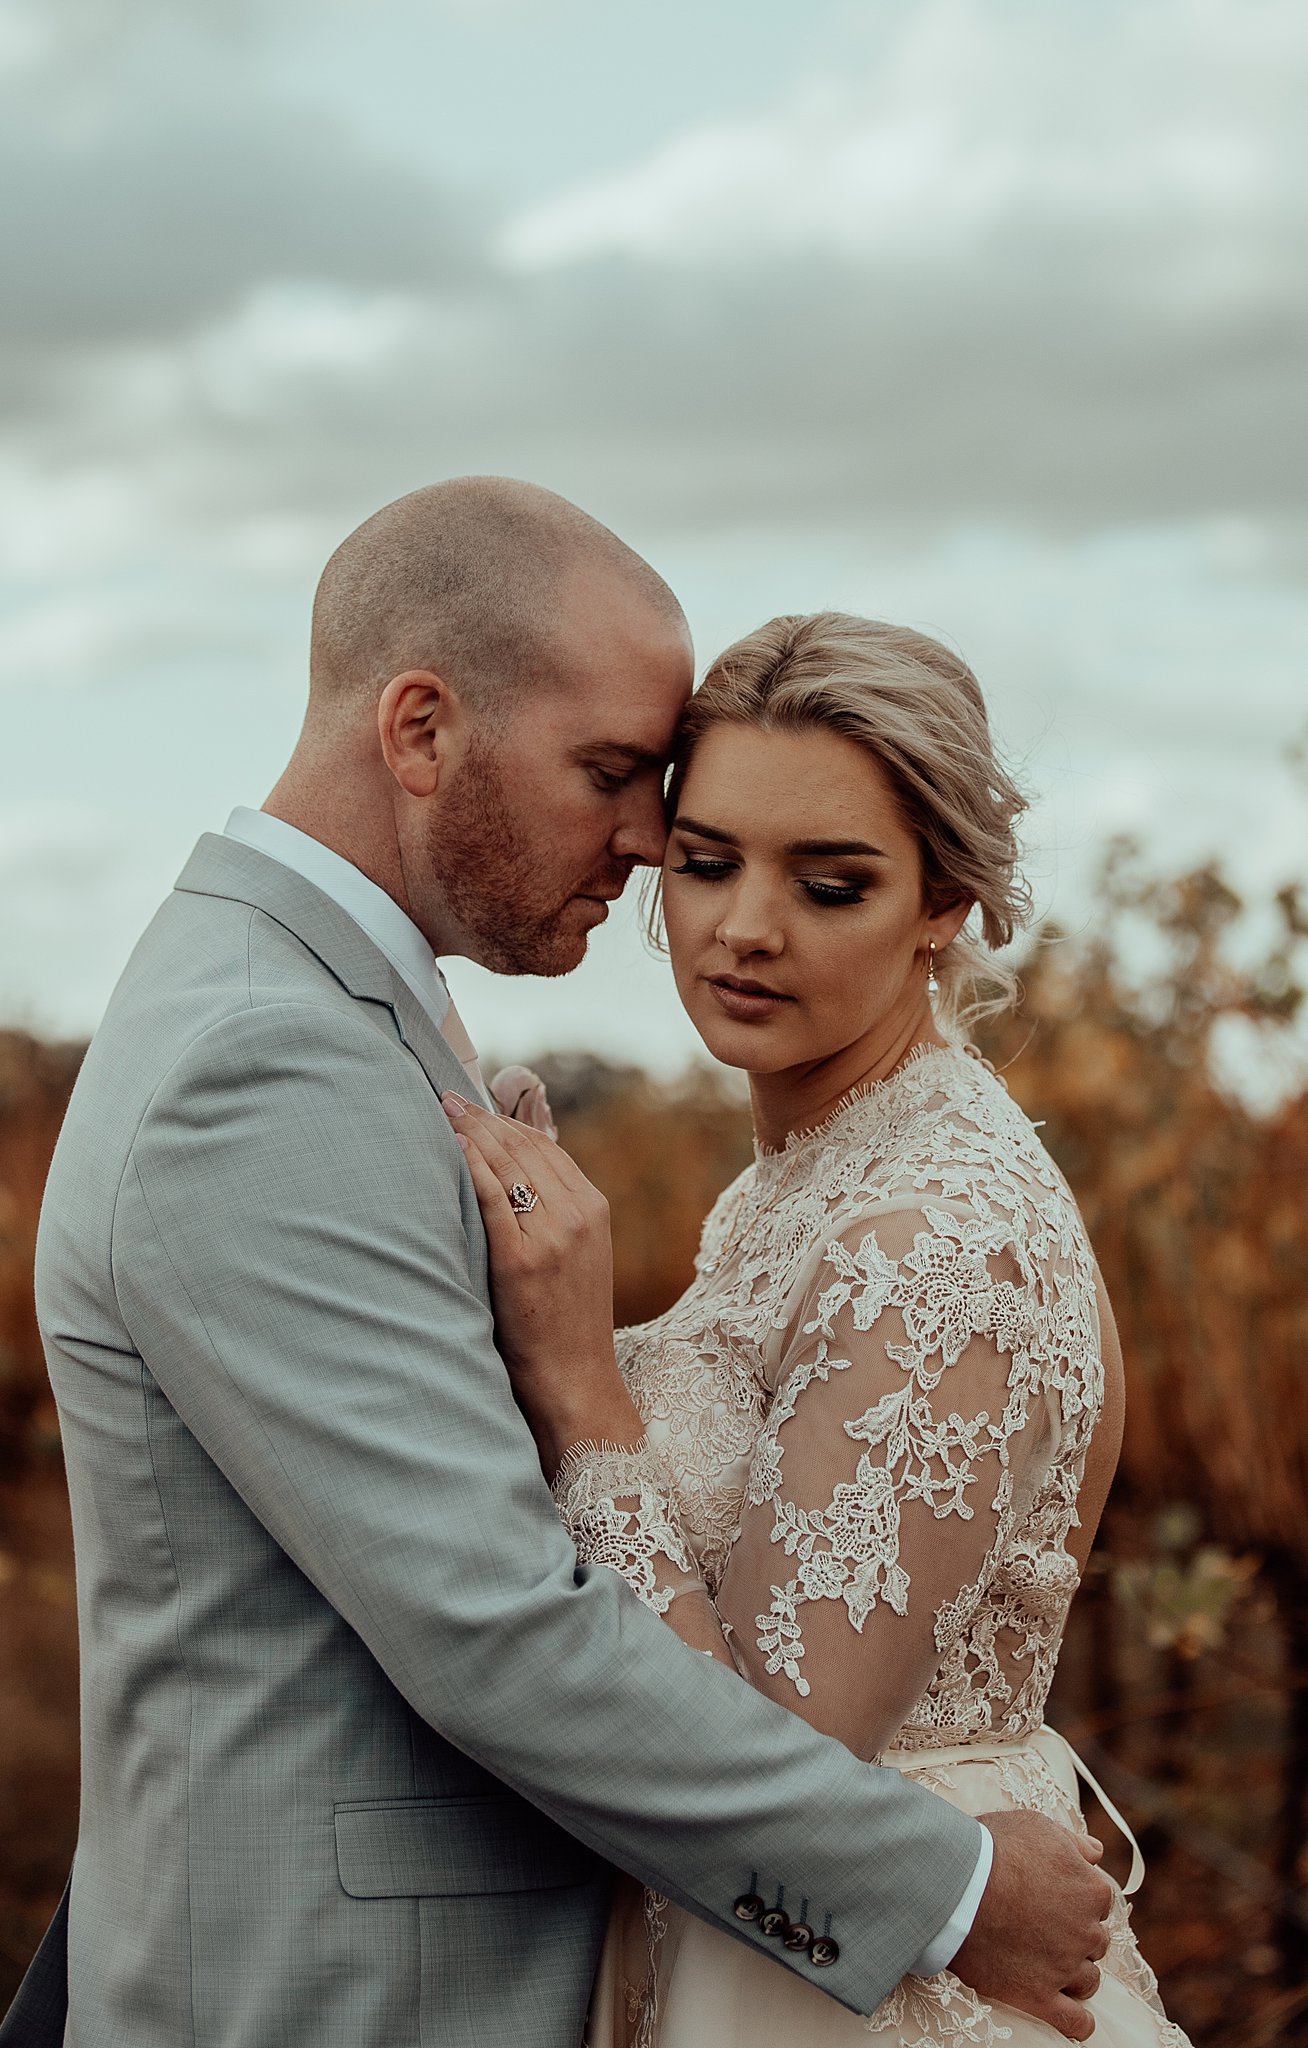 mickalathomas_puremacphotography_weddingphotographer_couplephotographer_Sheppartonphotographer_3454.jpg